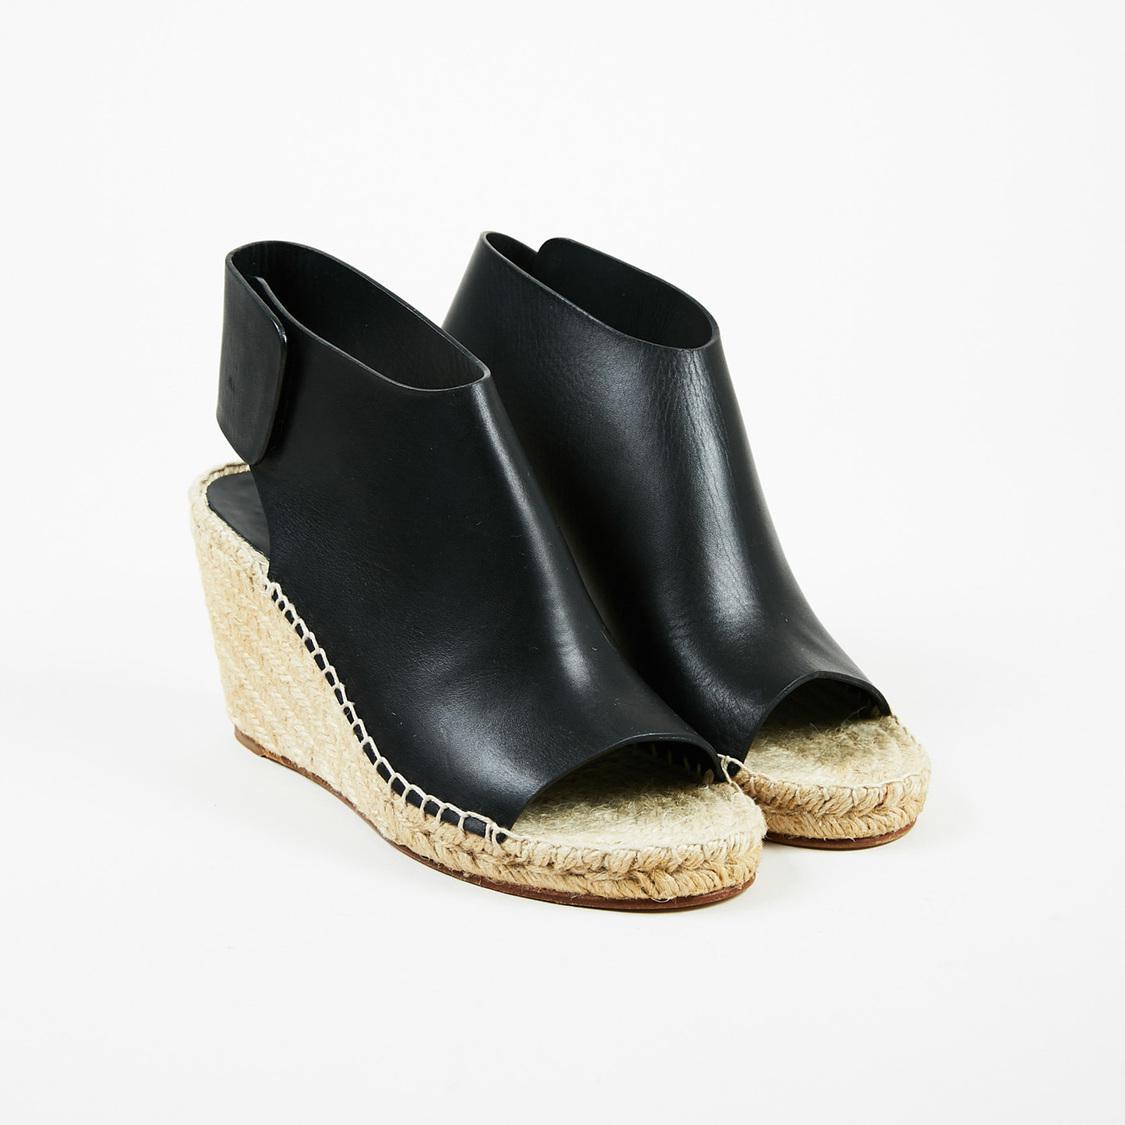 675b6cb62d4 Lyst - Céline Nwt Black Leather Peep Toe Espadrille Wedge Sandals Sz ...